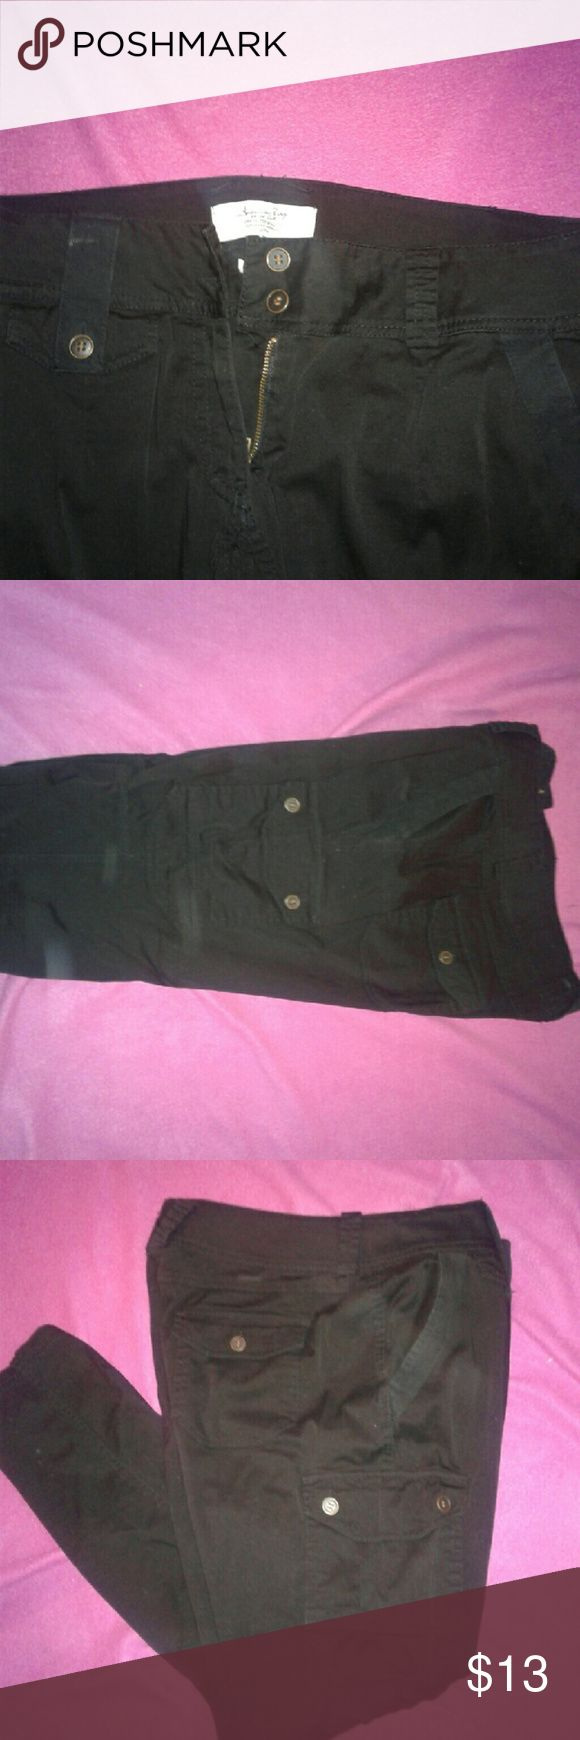 American Rag cargo pants American Rag size 15 black cargo pants American Rag Pants Skinny